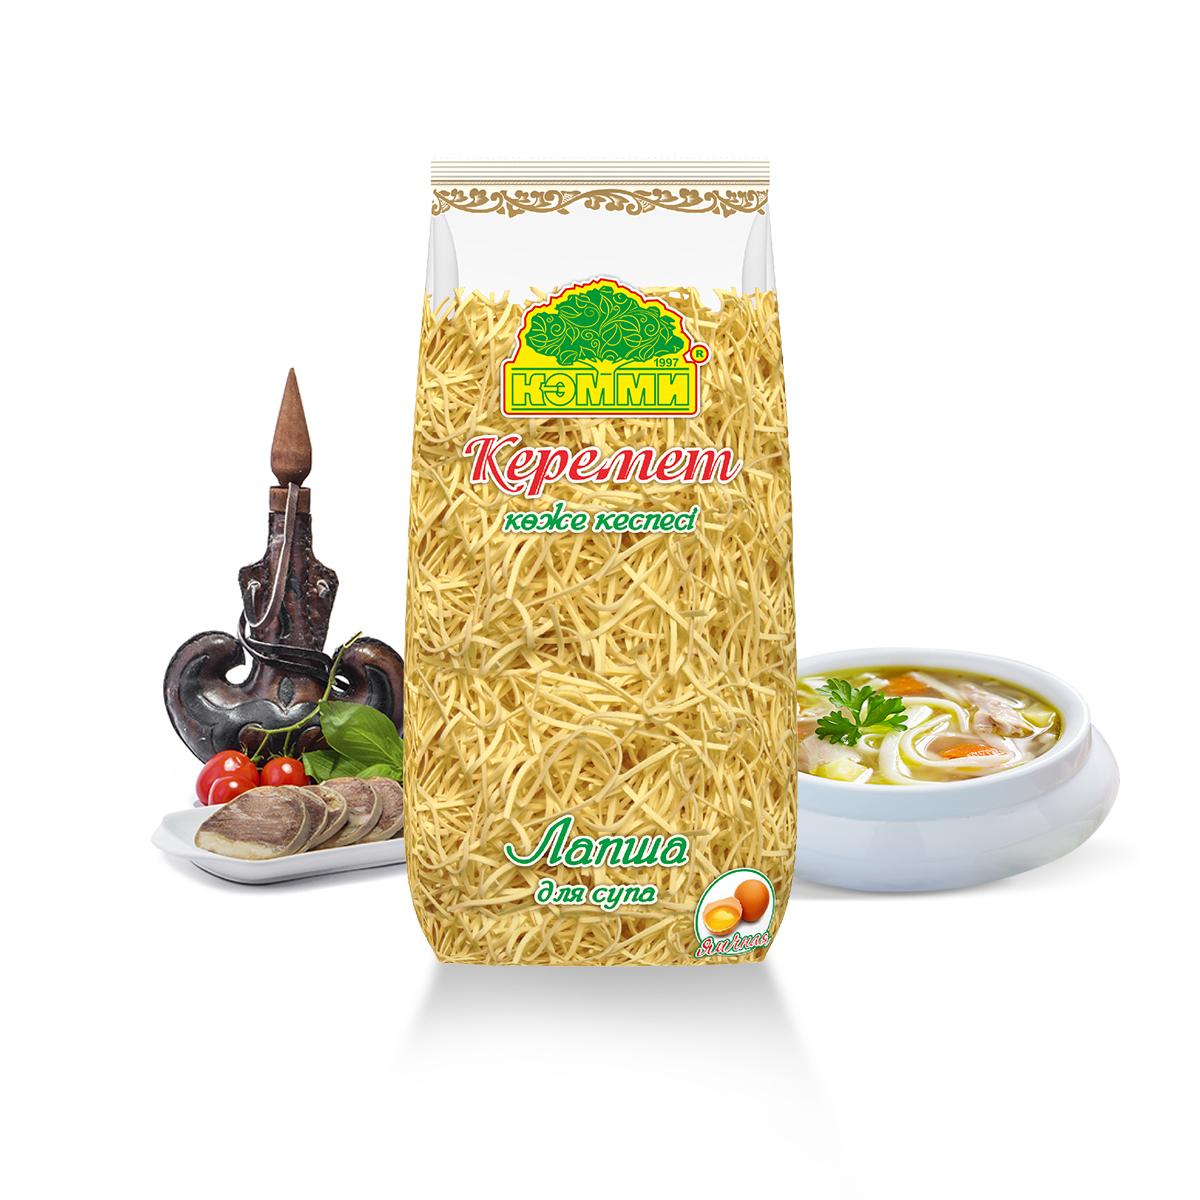 Лапша для Супа Яичная Керемет 500 гр (Кэмми)